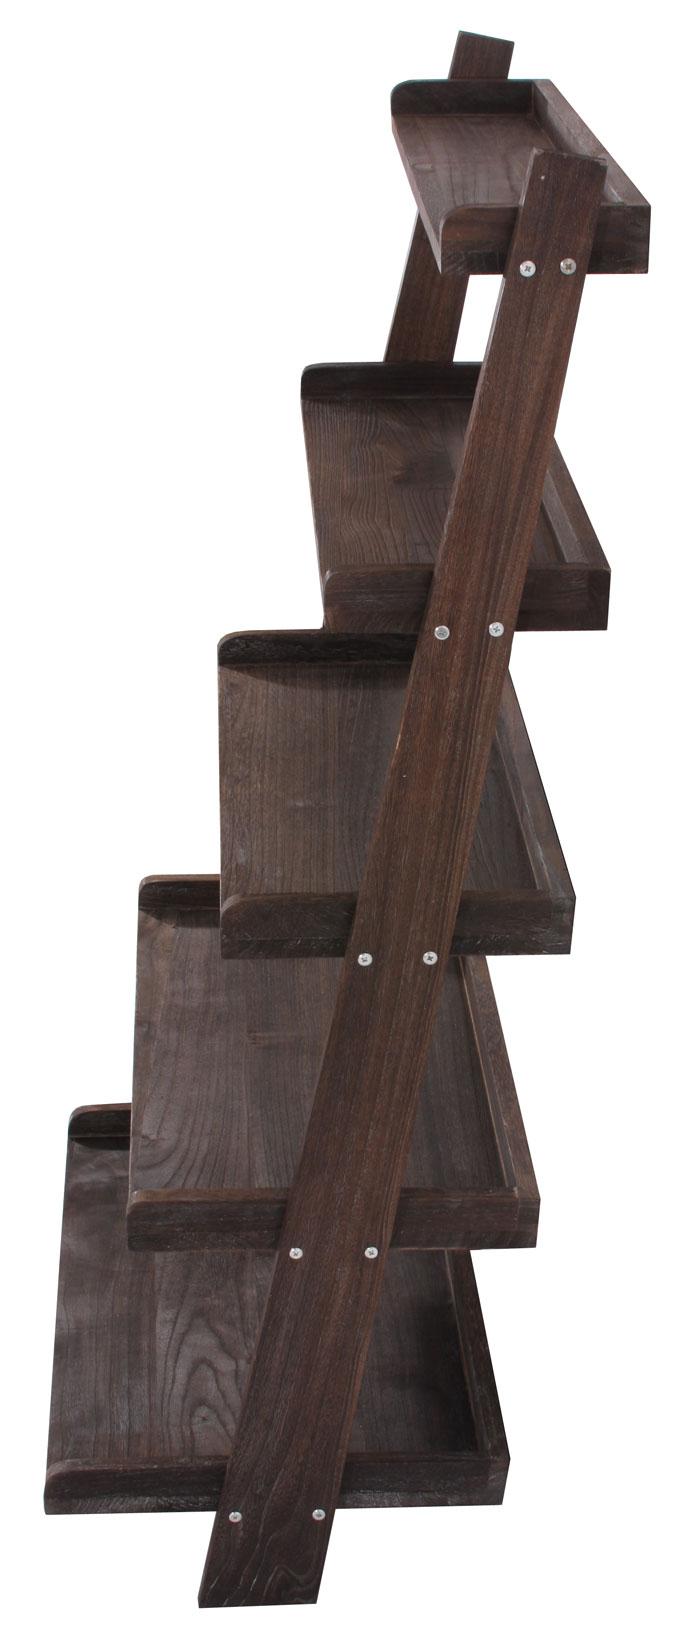 regal standregal pflanzregal blumenst nder 119x64x38cm shabby look vintage braun. Black Bedroom Furniture Sets. Home Design Ideas